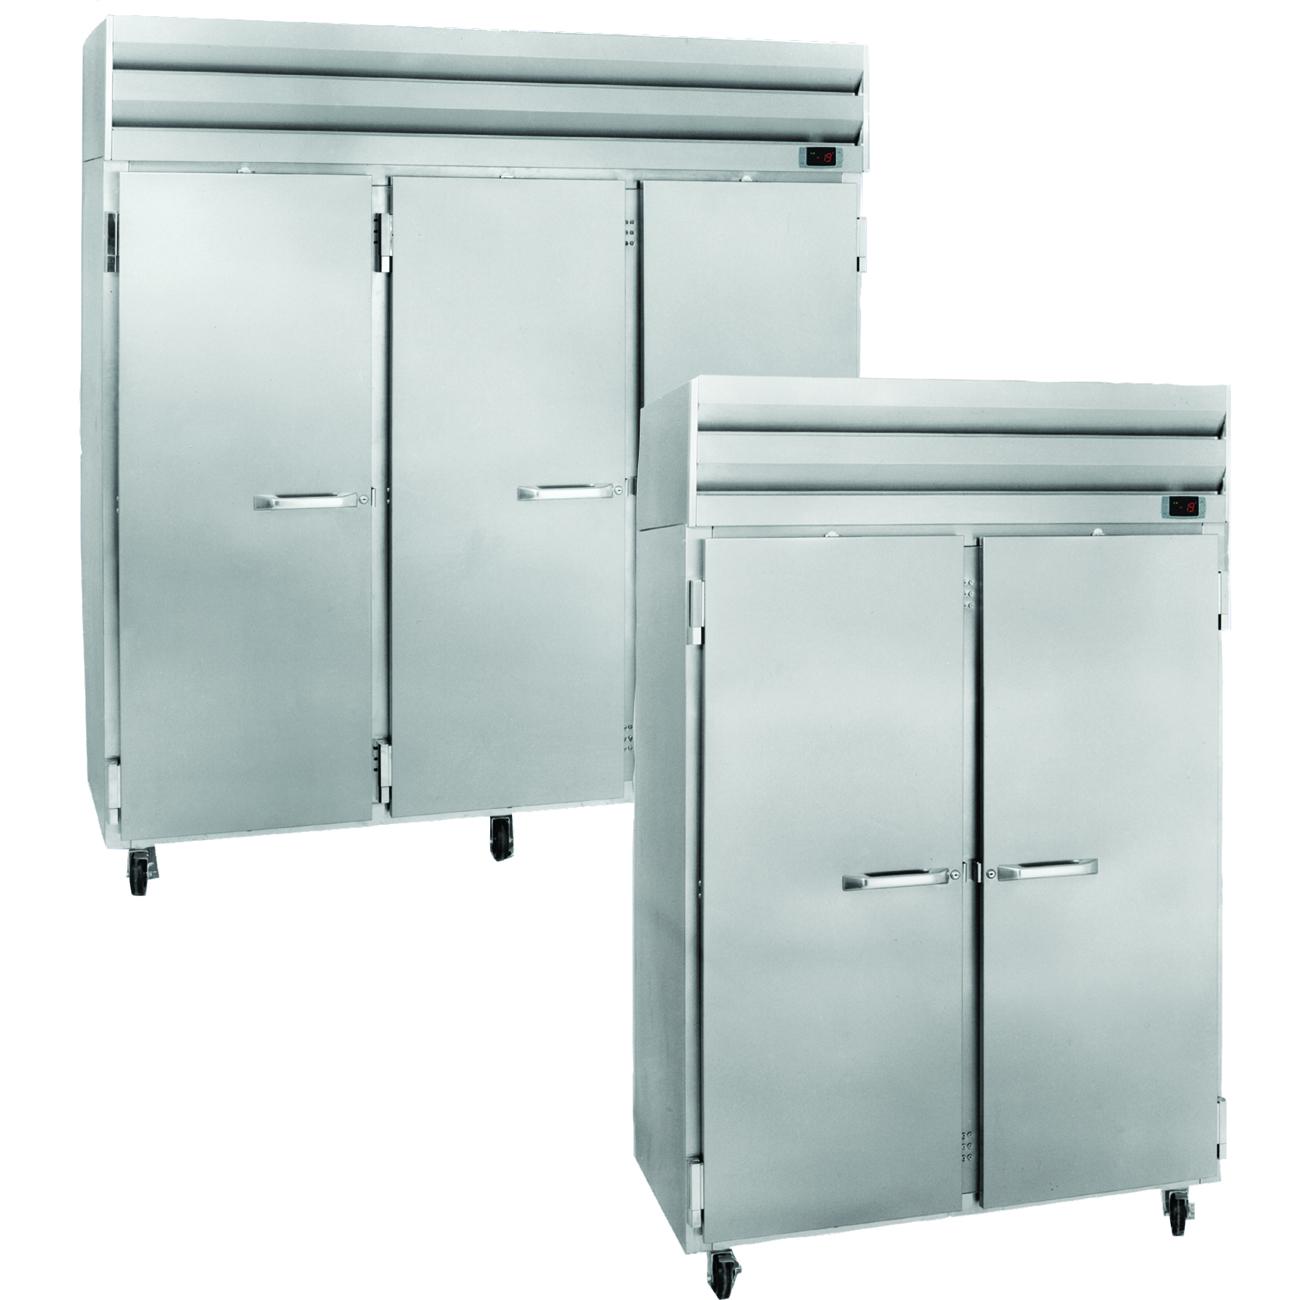 Howard-McCray R-SF48-FF freezer, reach-in